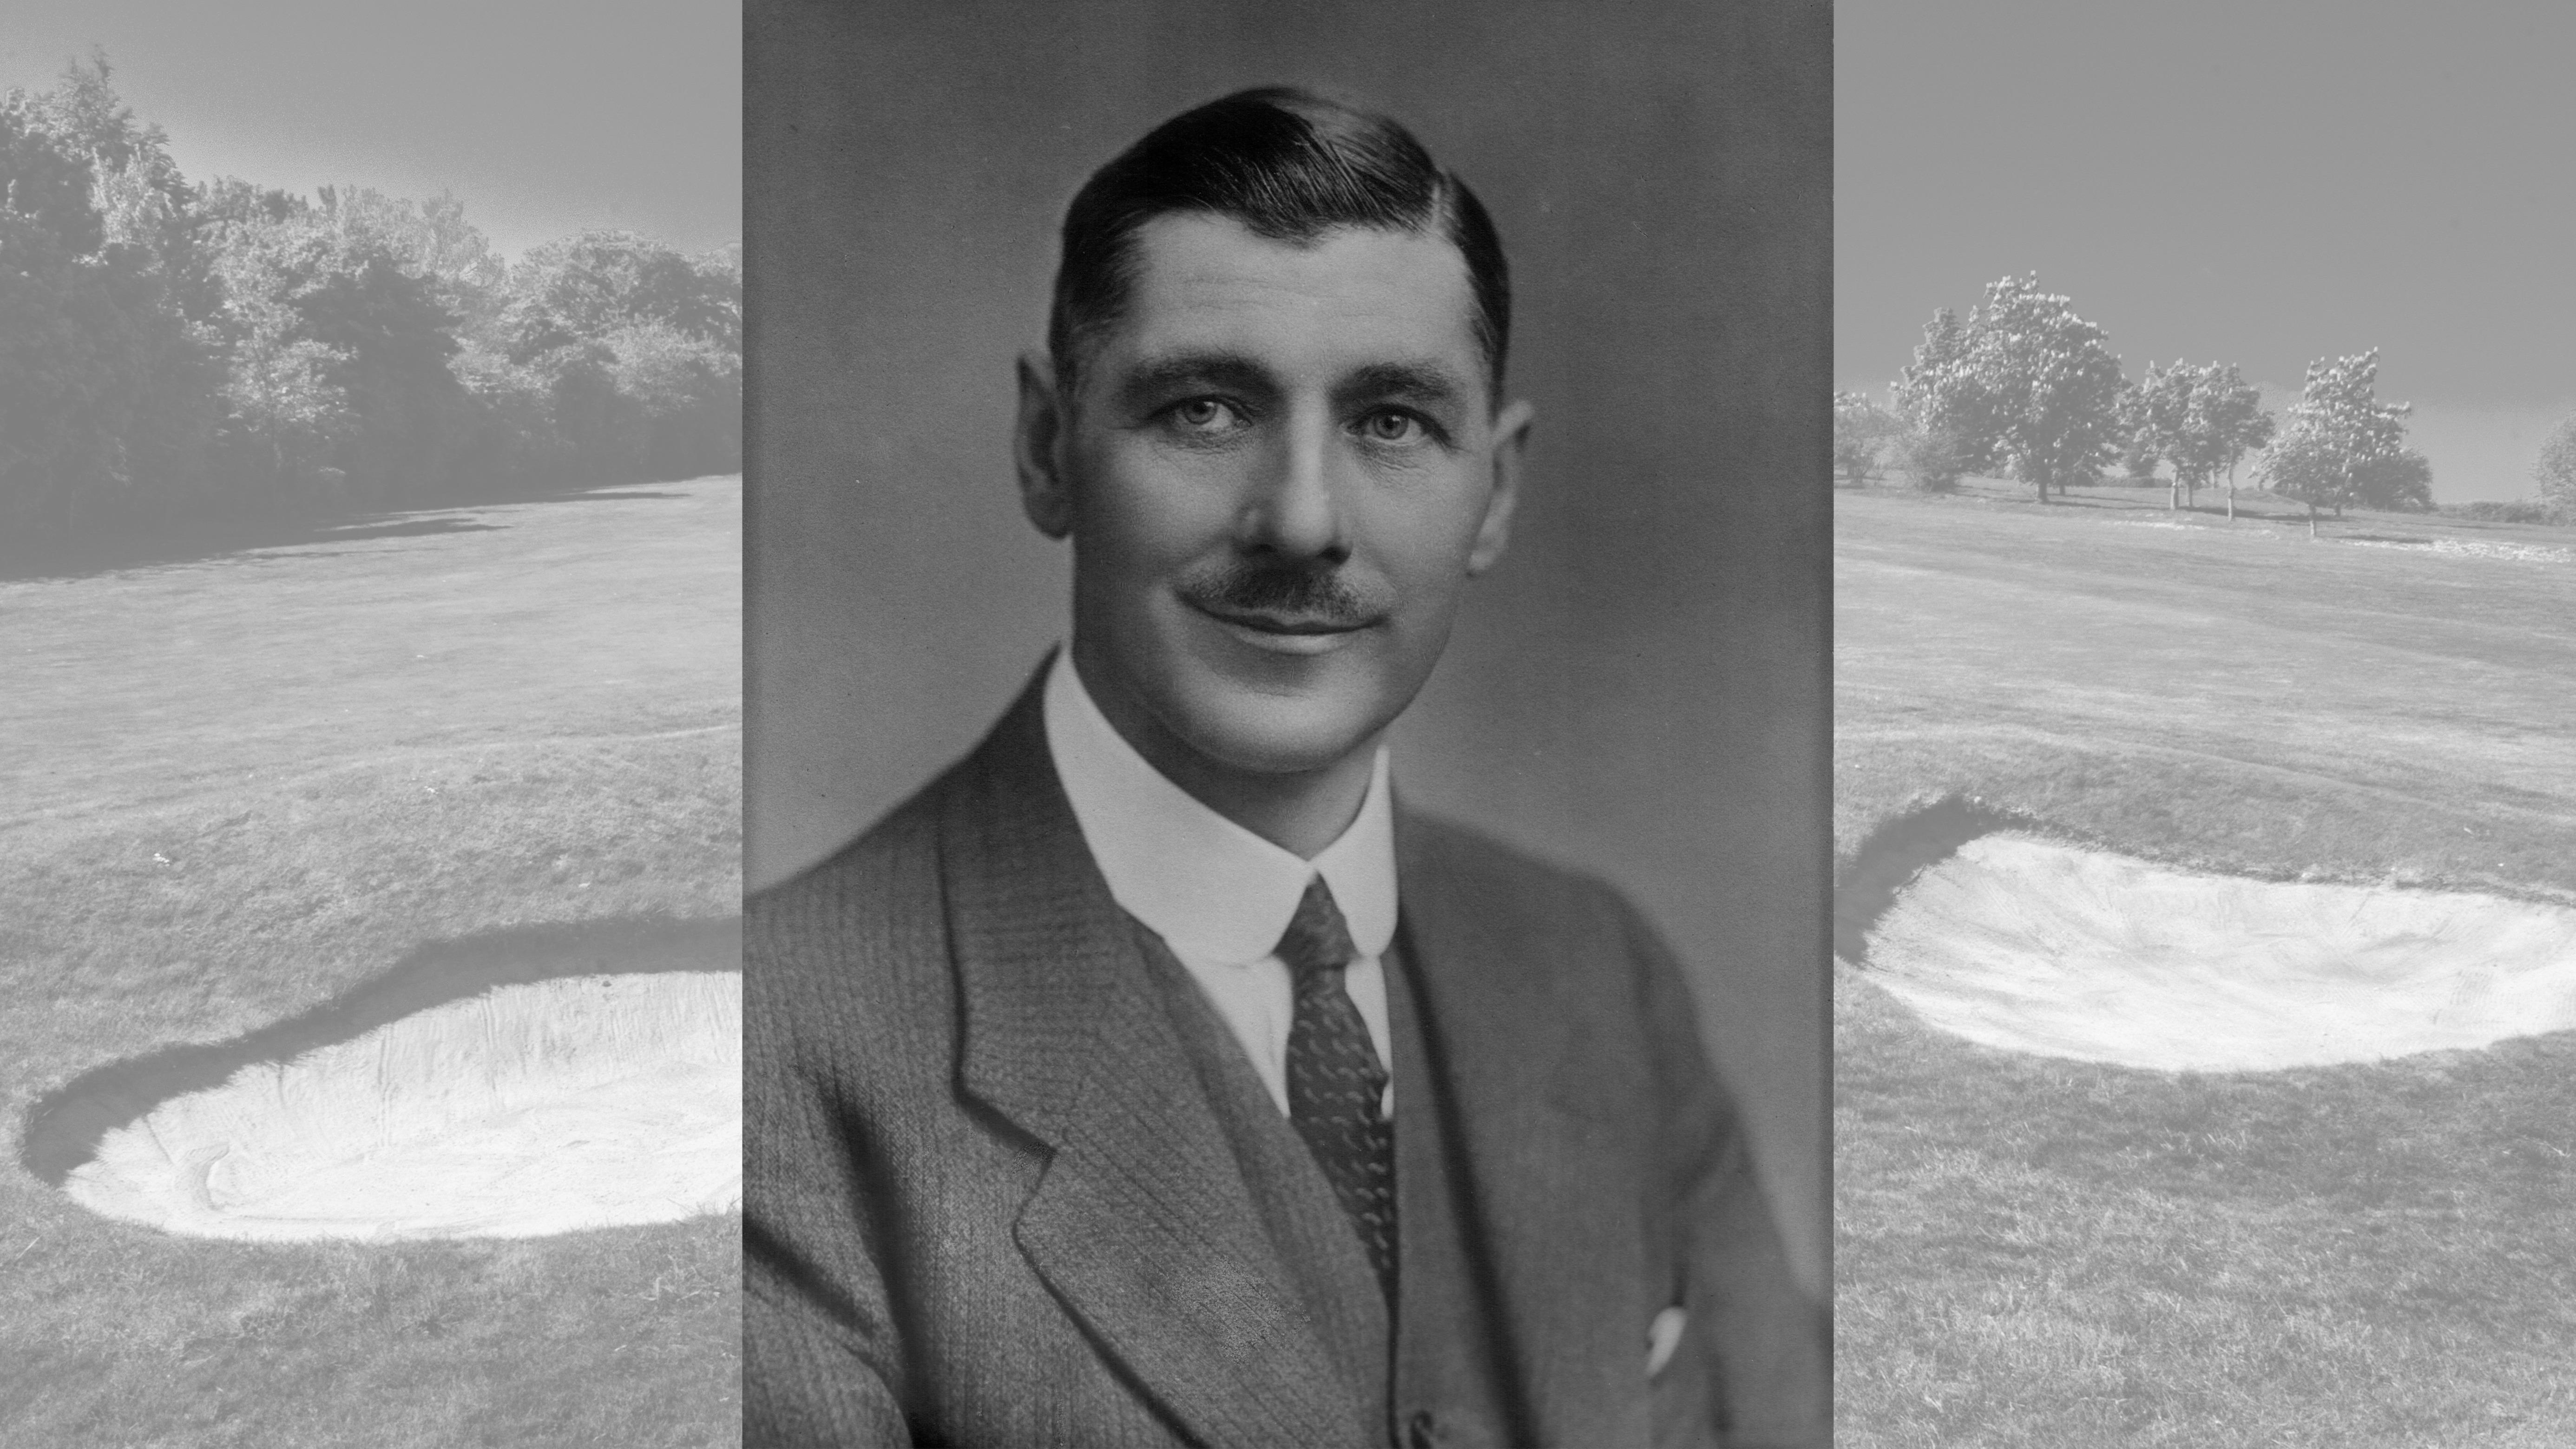 1921 - A Sapwell